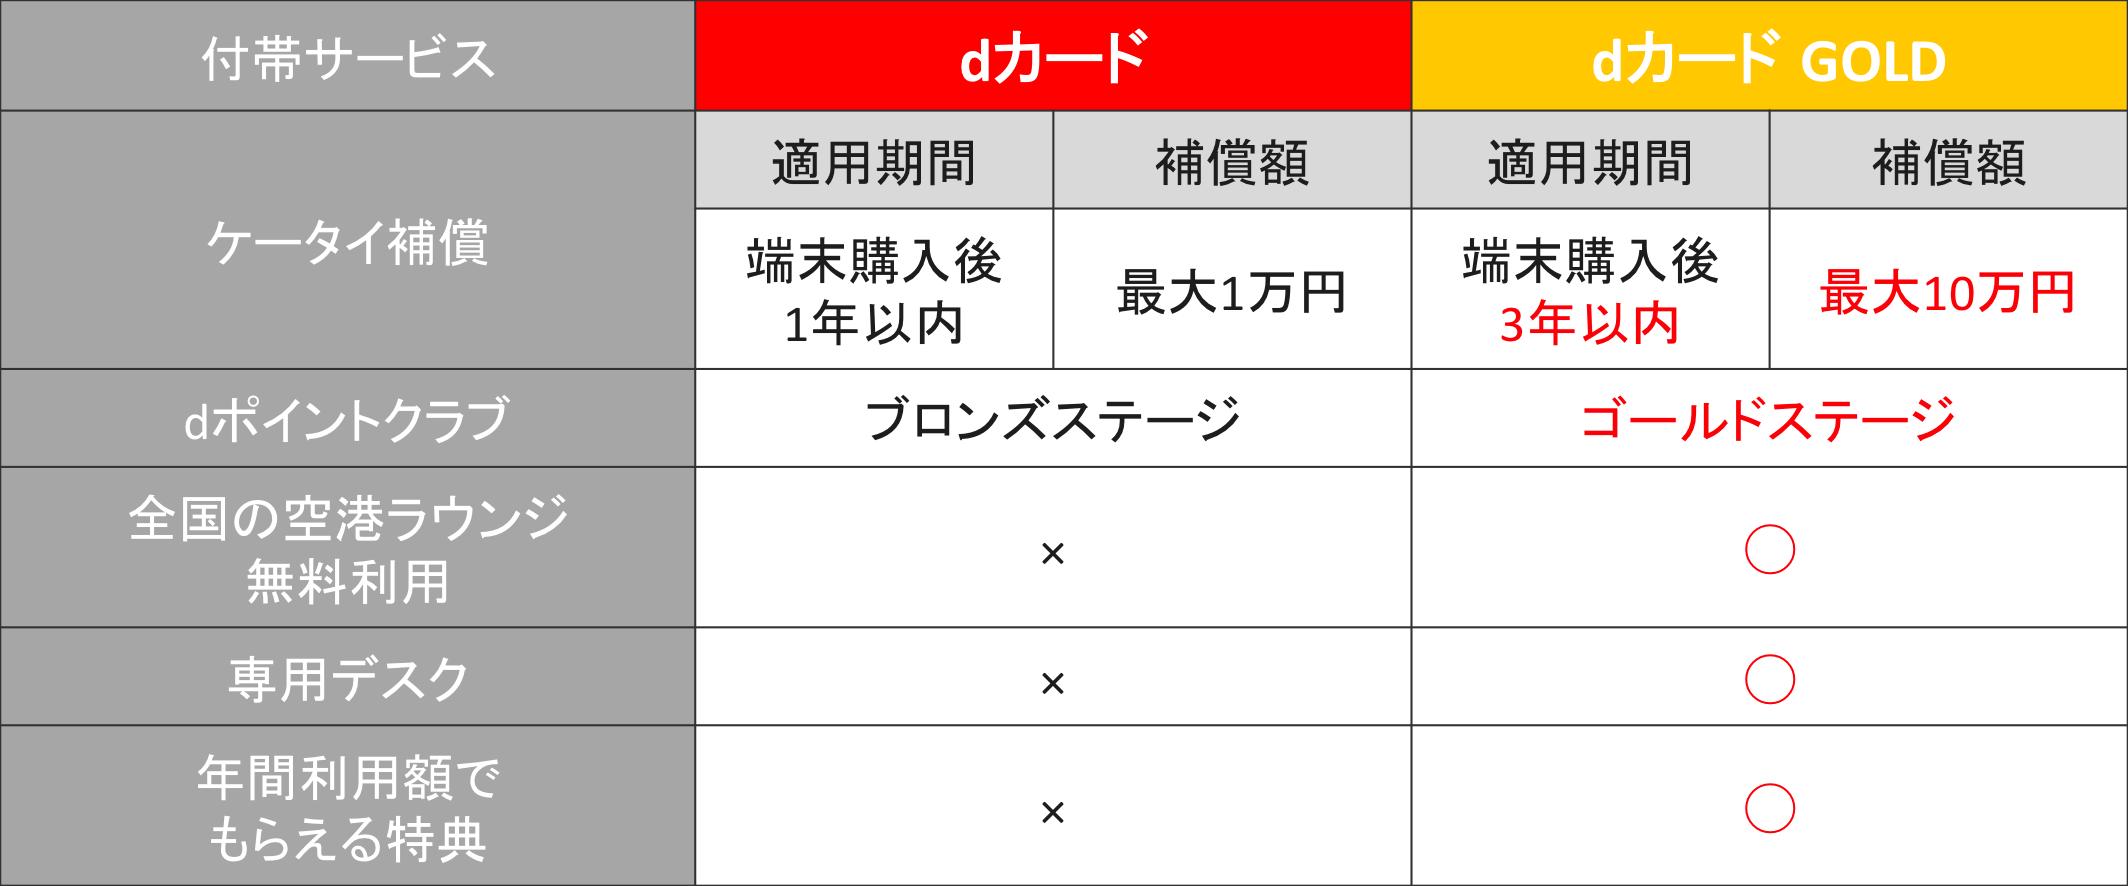 dカード/dカード GOLD 付帯サービス